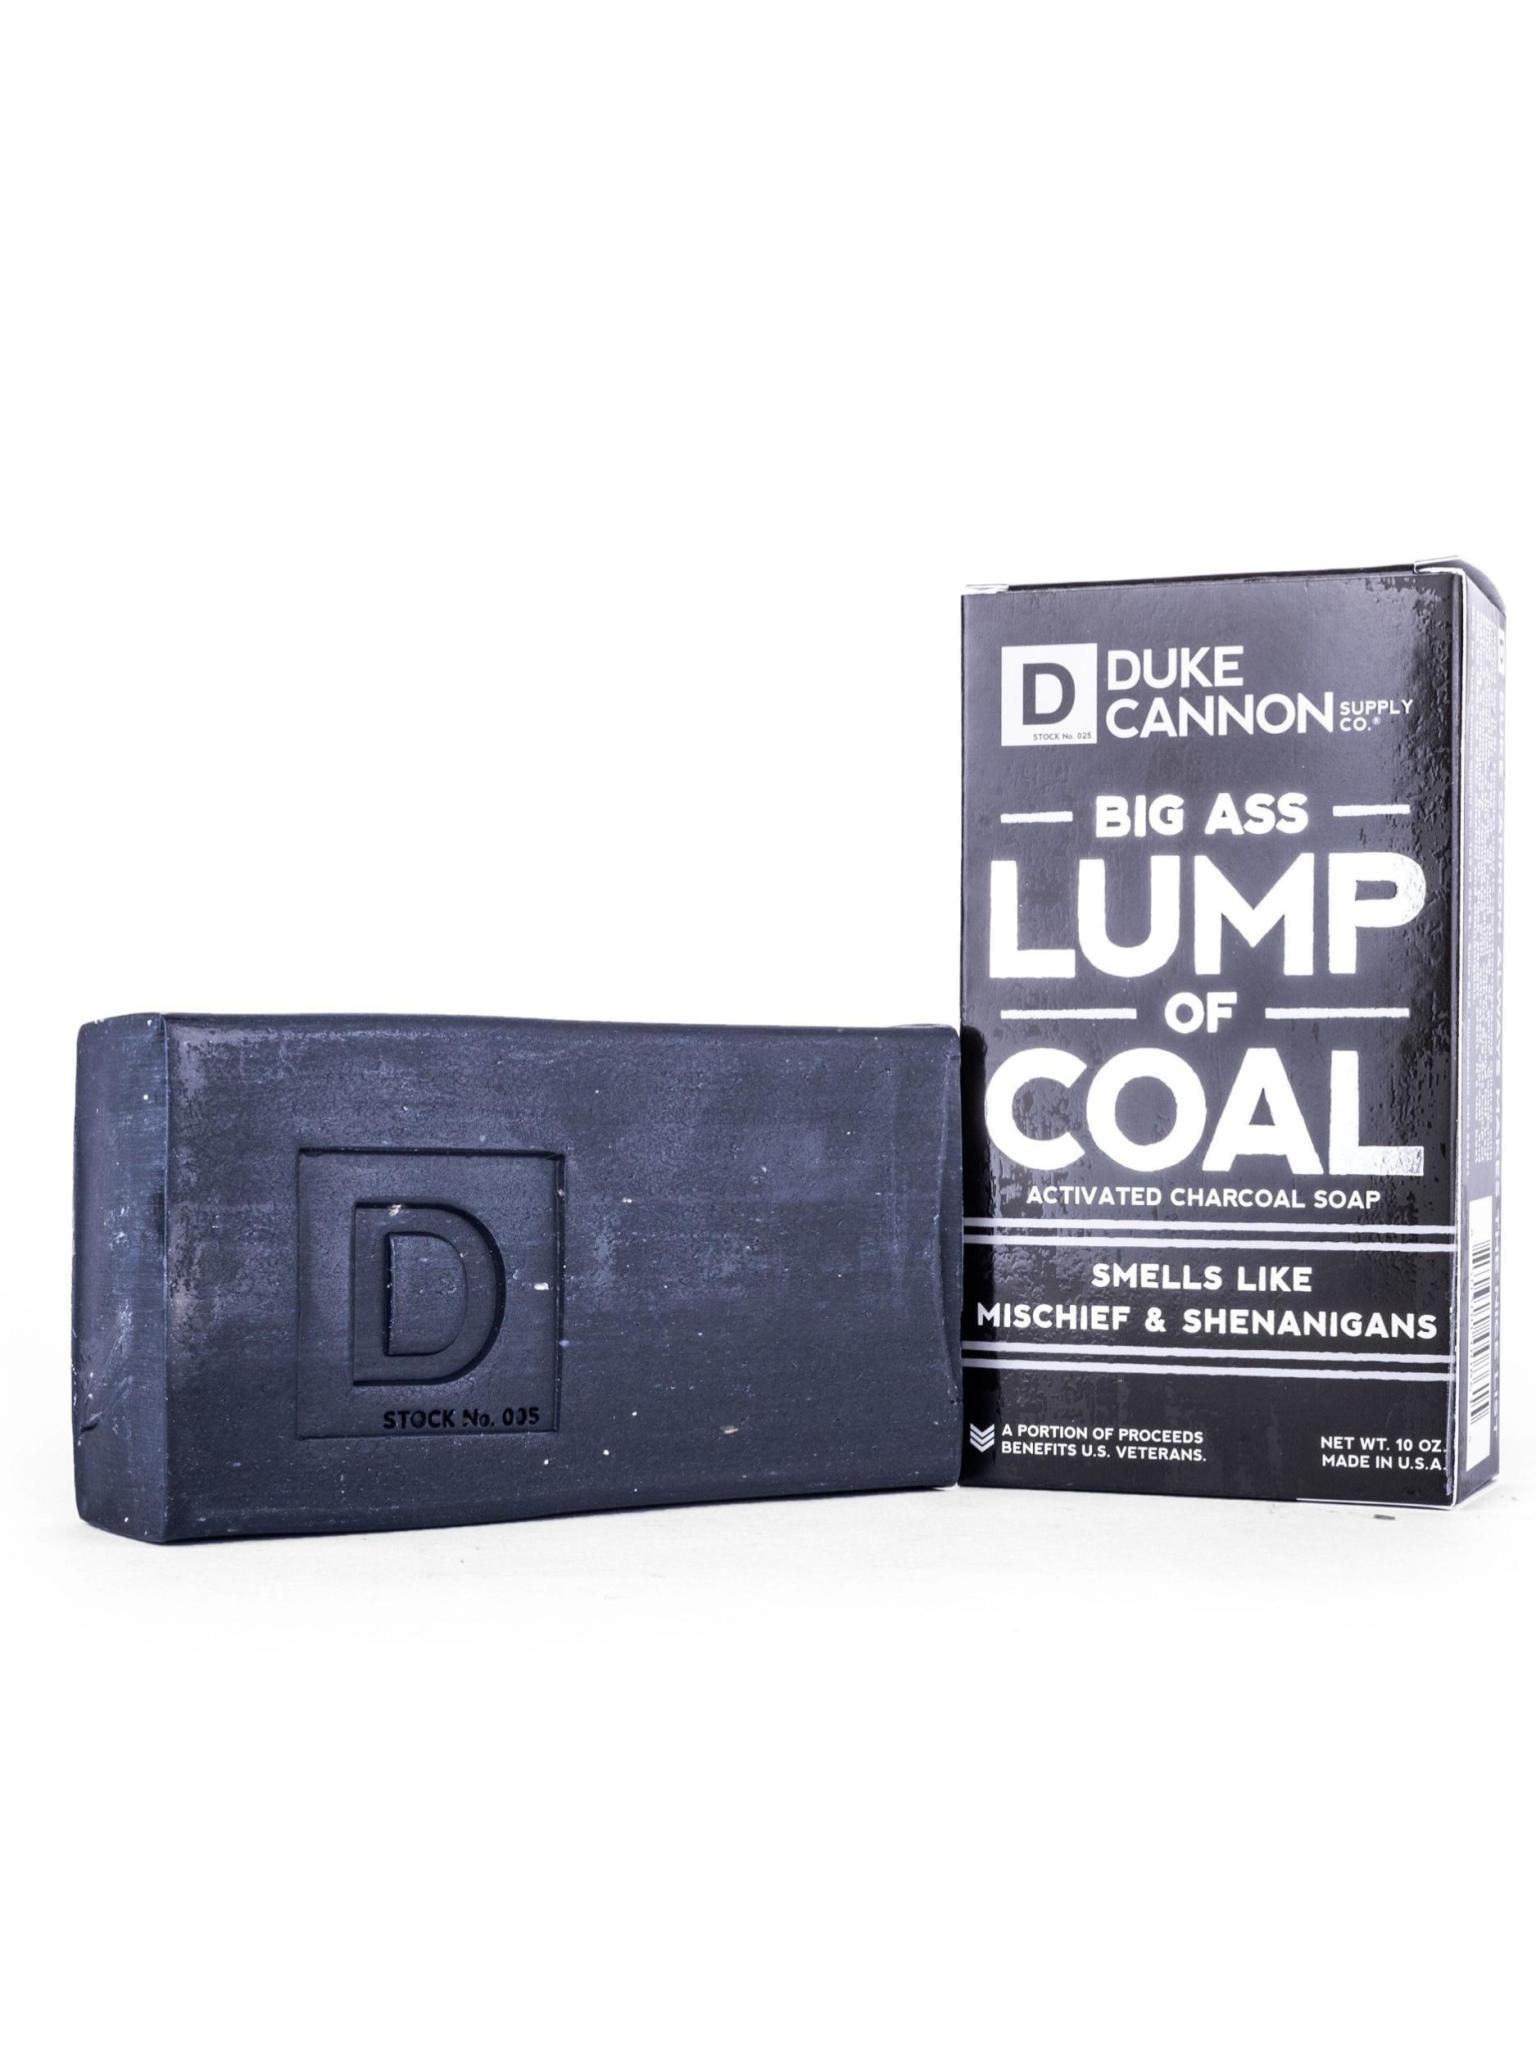 Duke Cannon Supply Co Big Ass Bar of Soap Lump of Coal